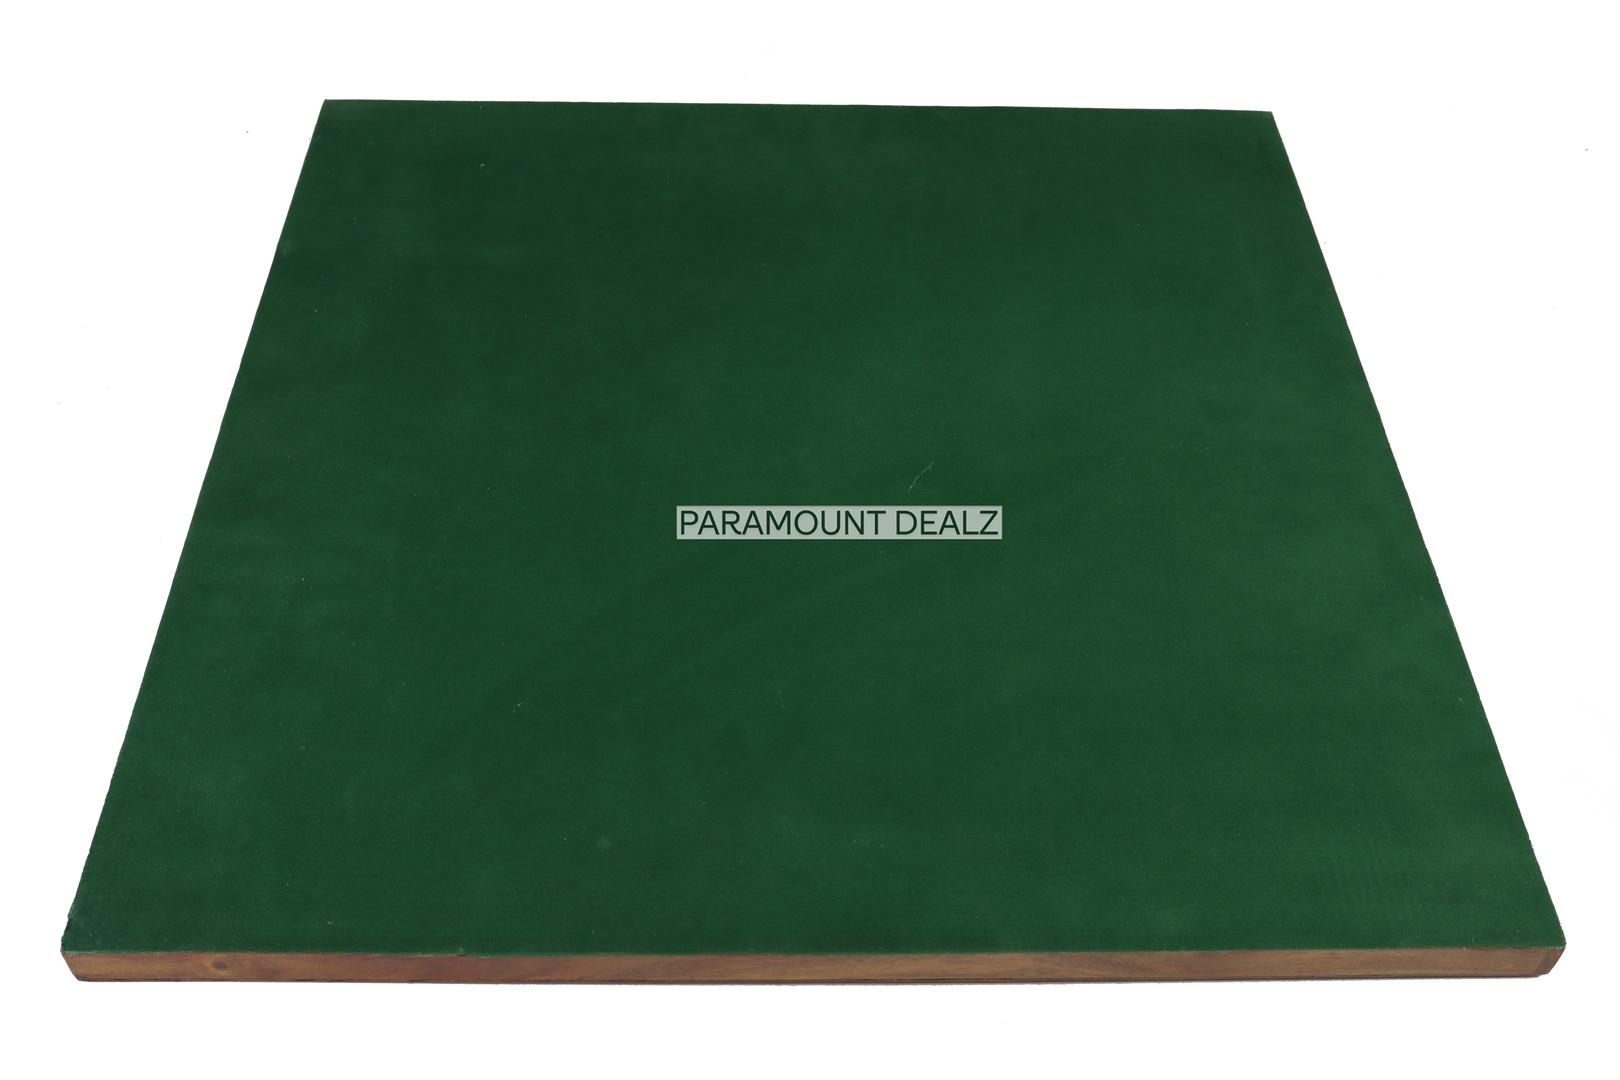 "WOODEN CHESS BOARD EBONY SHEESHAM WOOD 19"" - 50 MM"